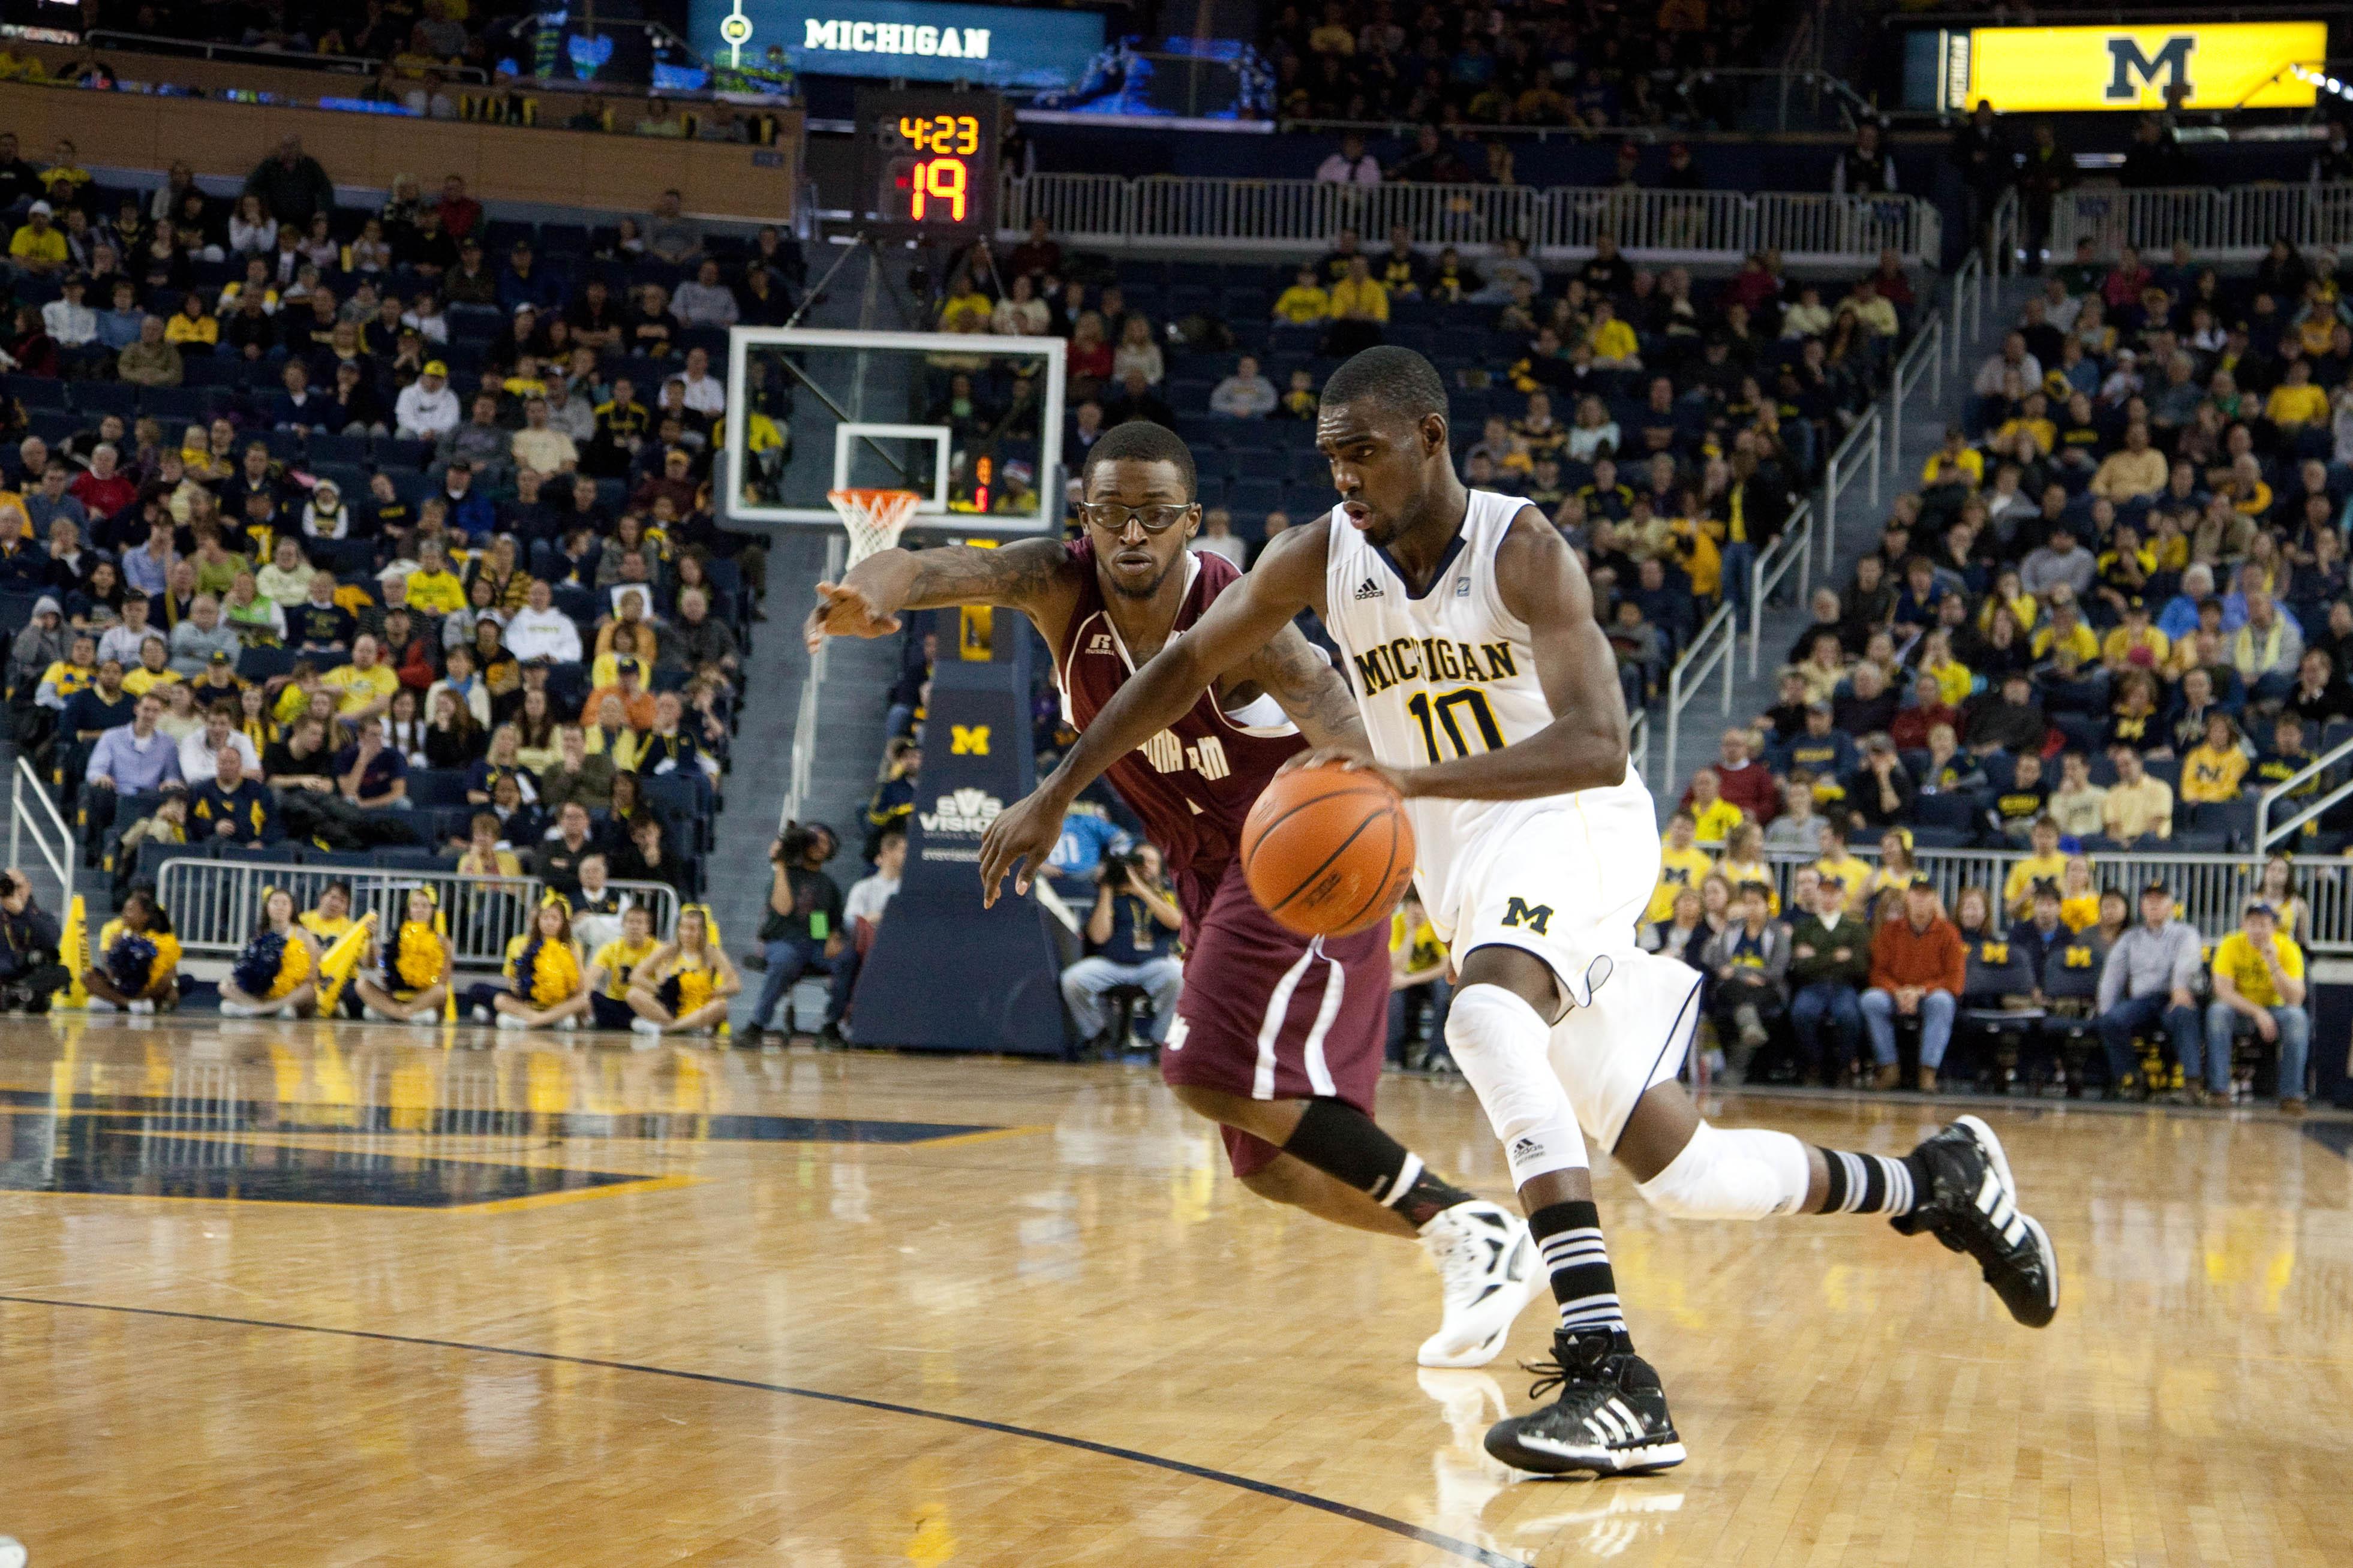 Alabama A&M at Michigan 16